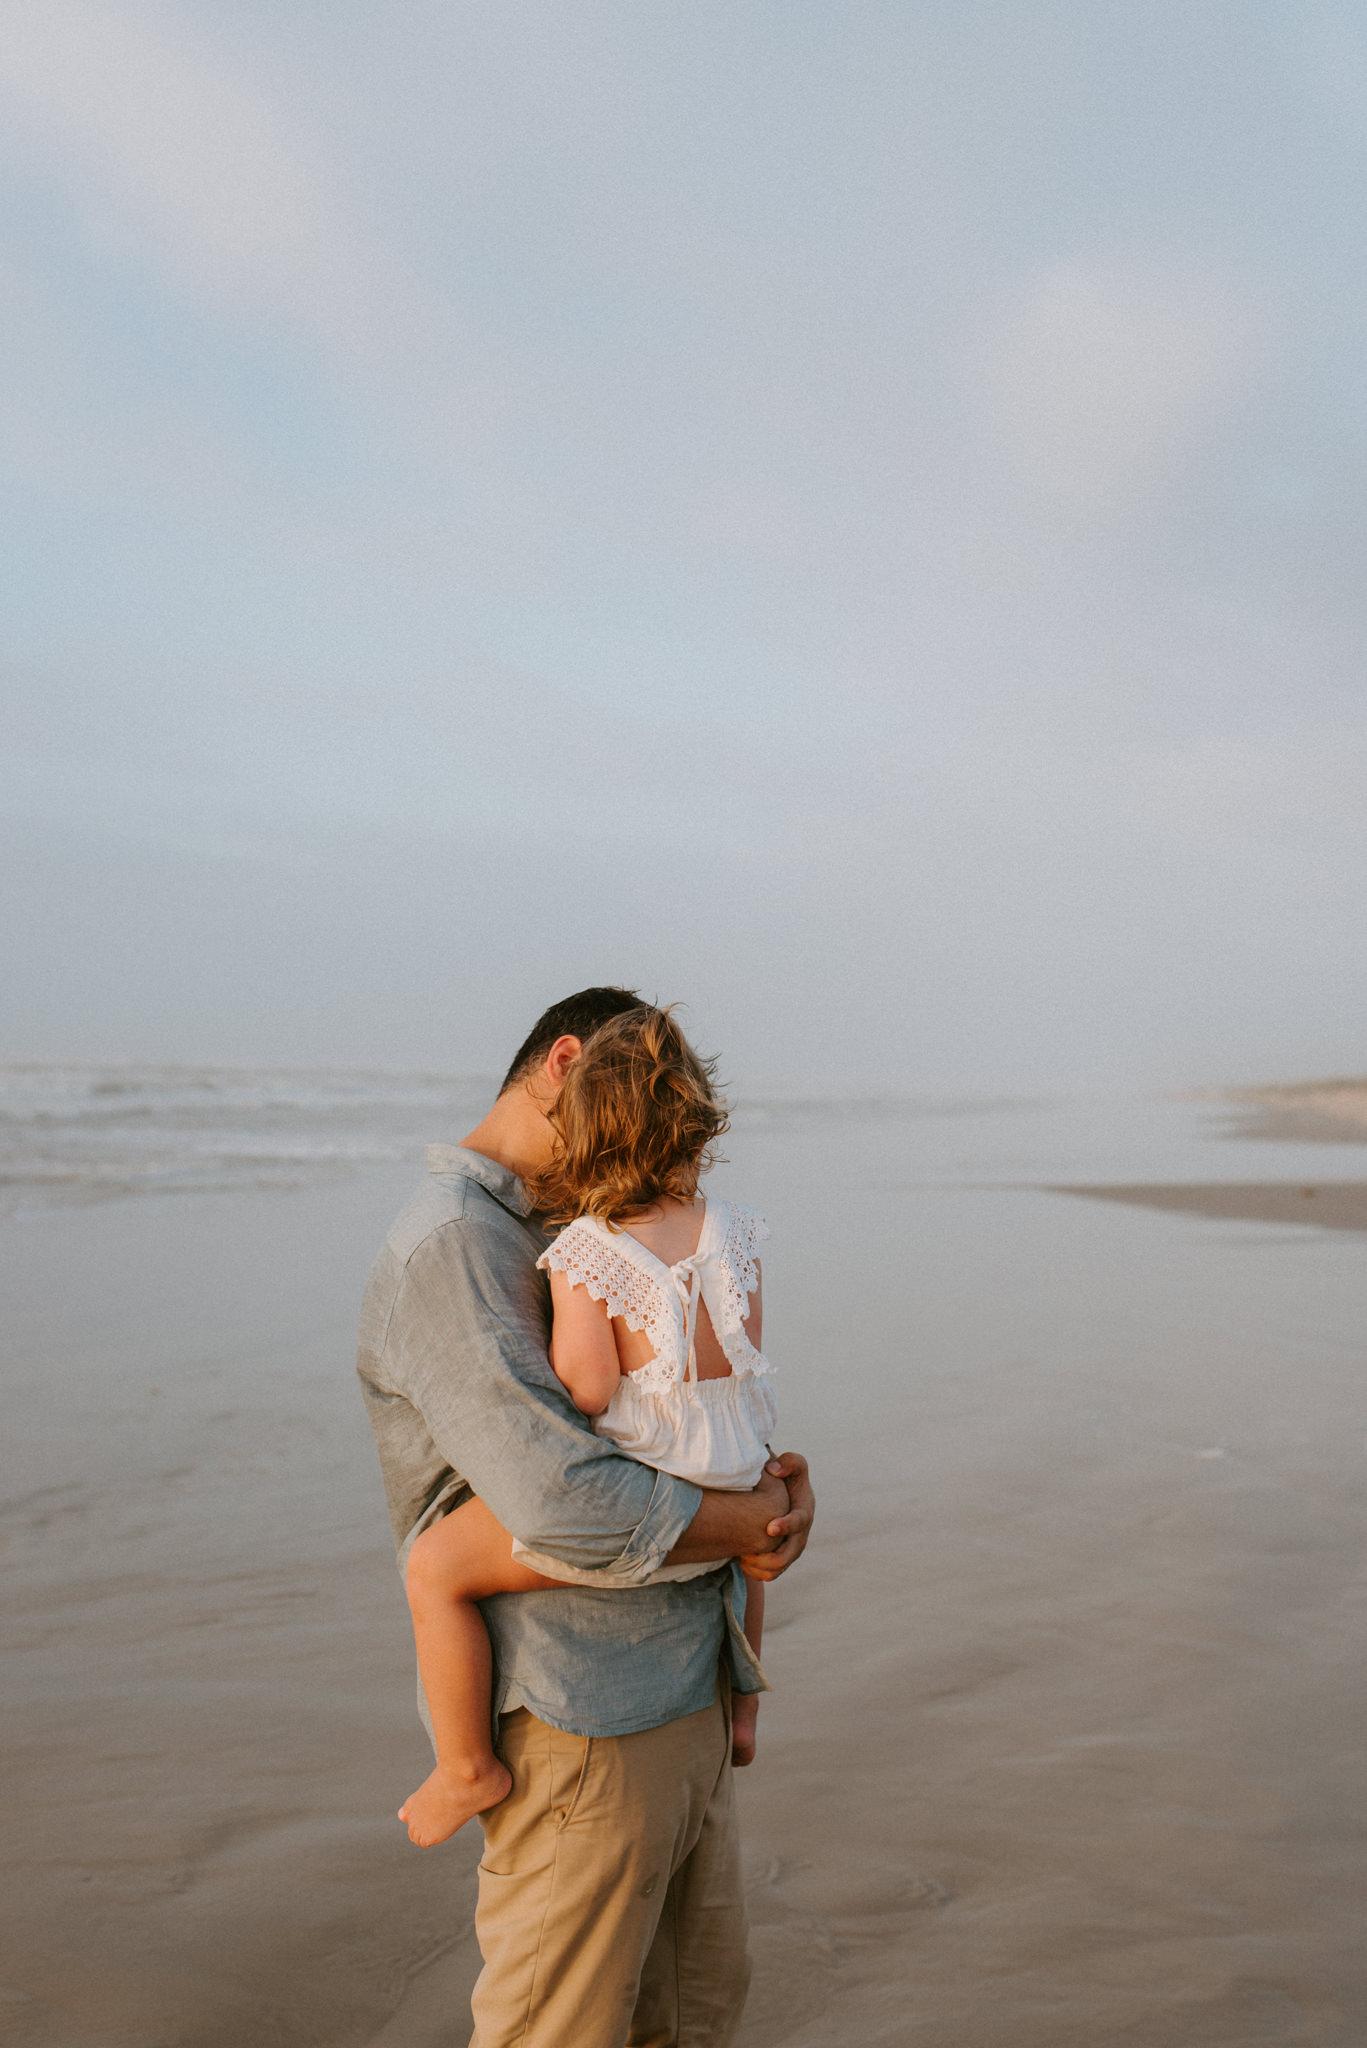 Corpus-Christi-Family-Photographer-Kerlyn-Van-Gelder-Photography92.jpg